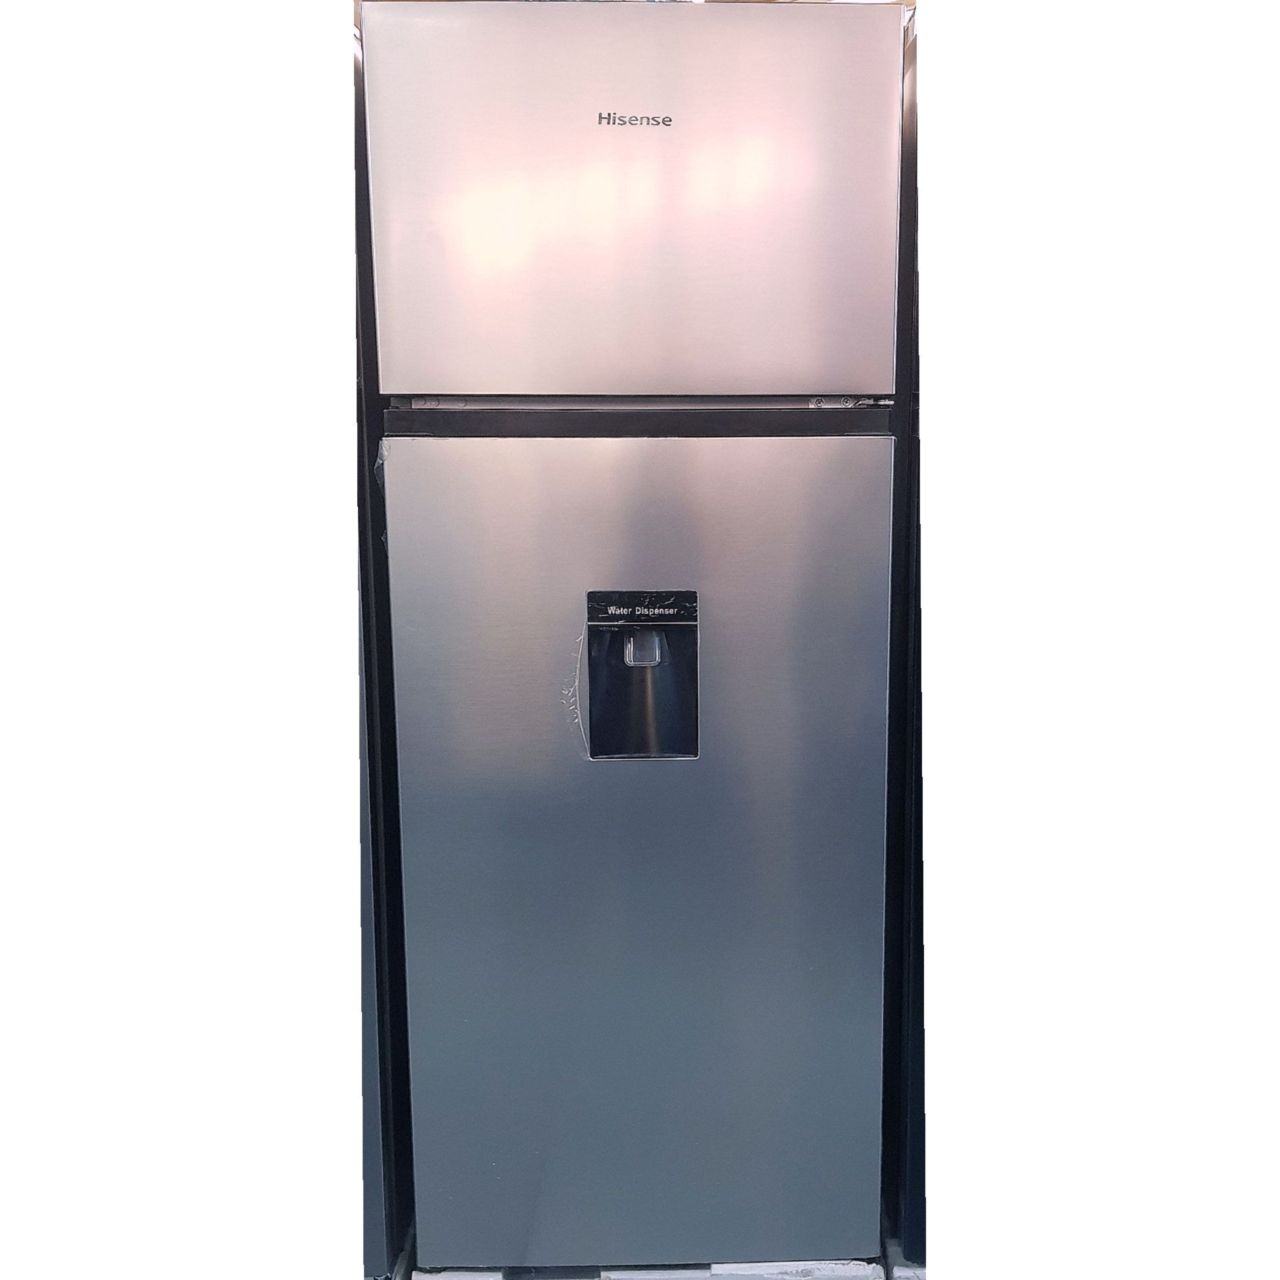 Холодильник двухкамерый Hisense 205 литров